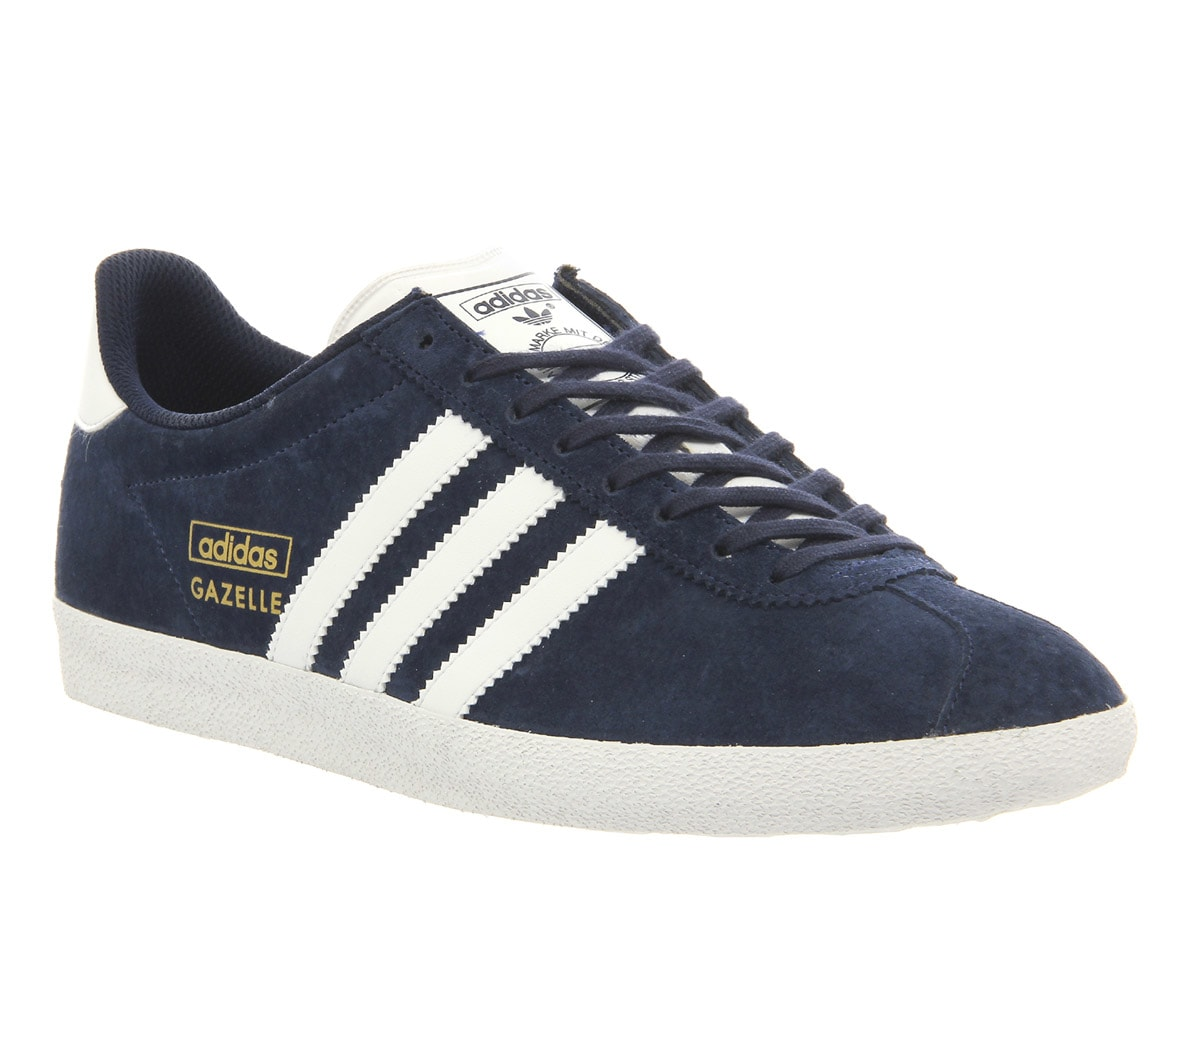 Adidas Gazelle Og Black Ebay